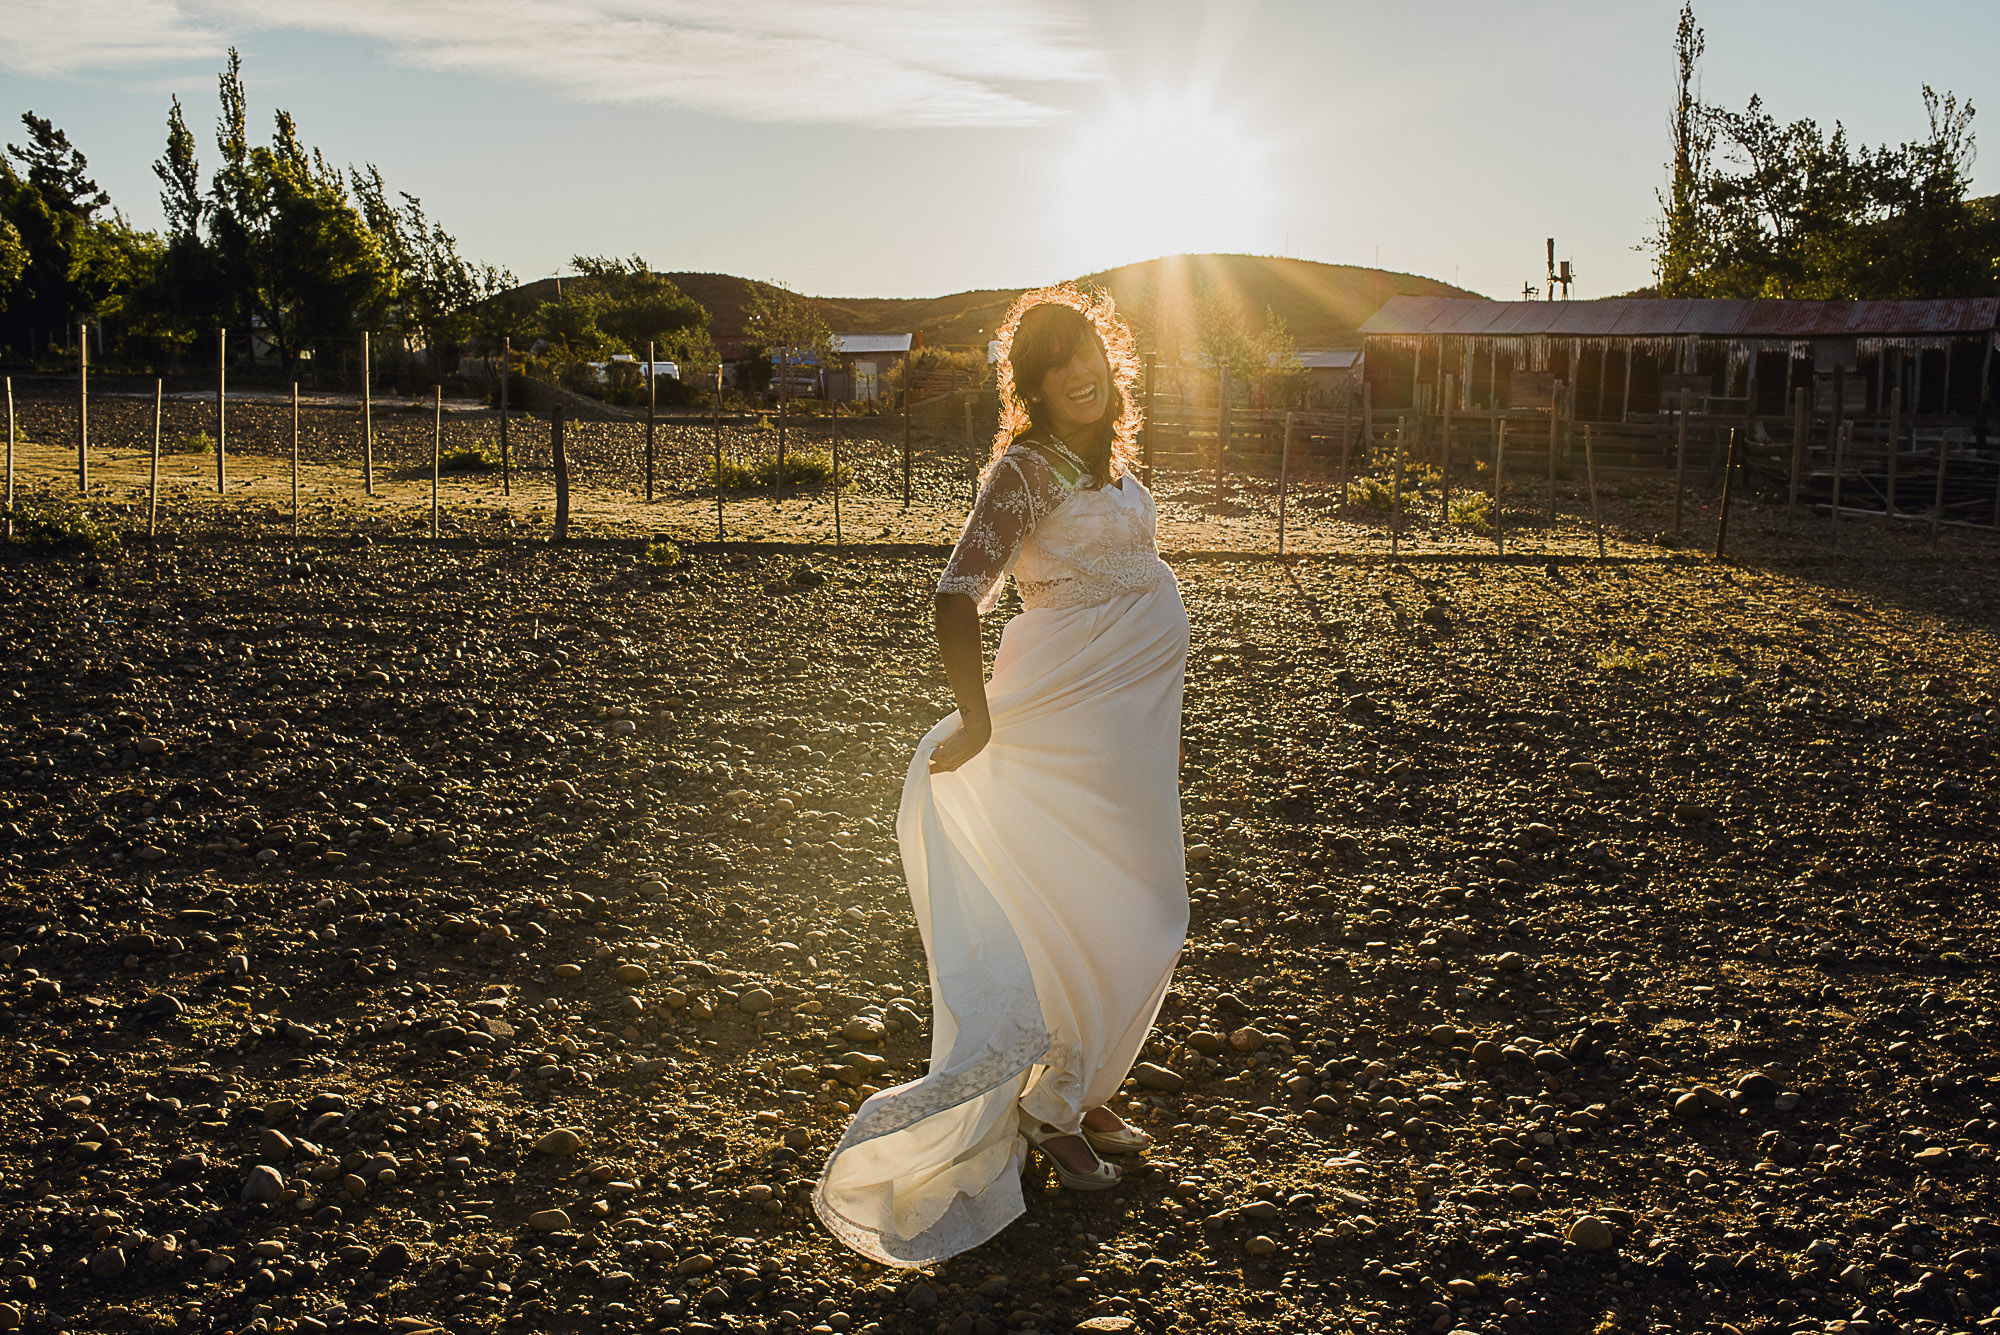 post-boda-trash-the-dress-marifer-y-felix-fotografia-de-bodas-en-patagonia-gabriel-roa-photography-11